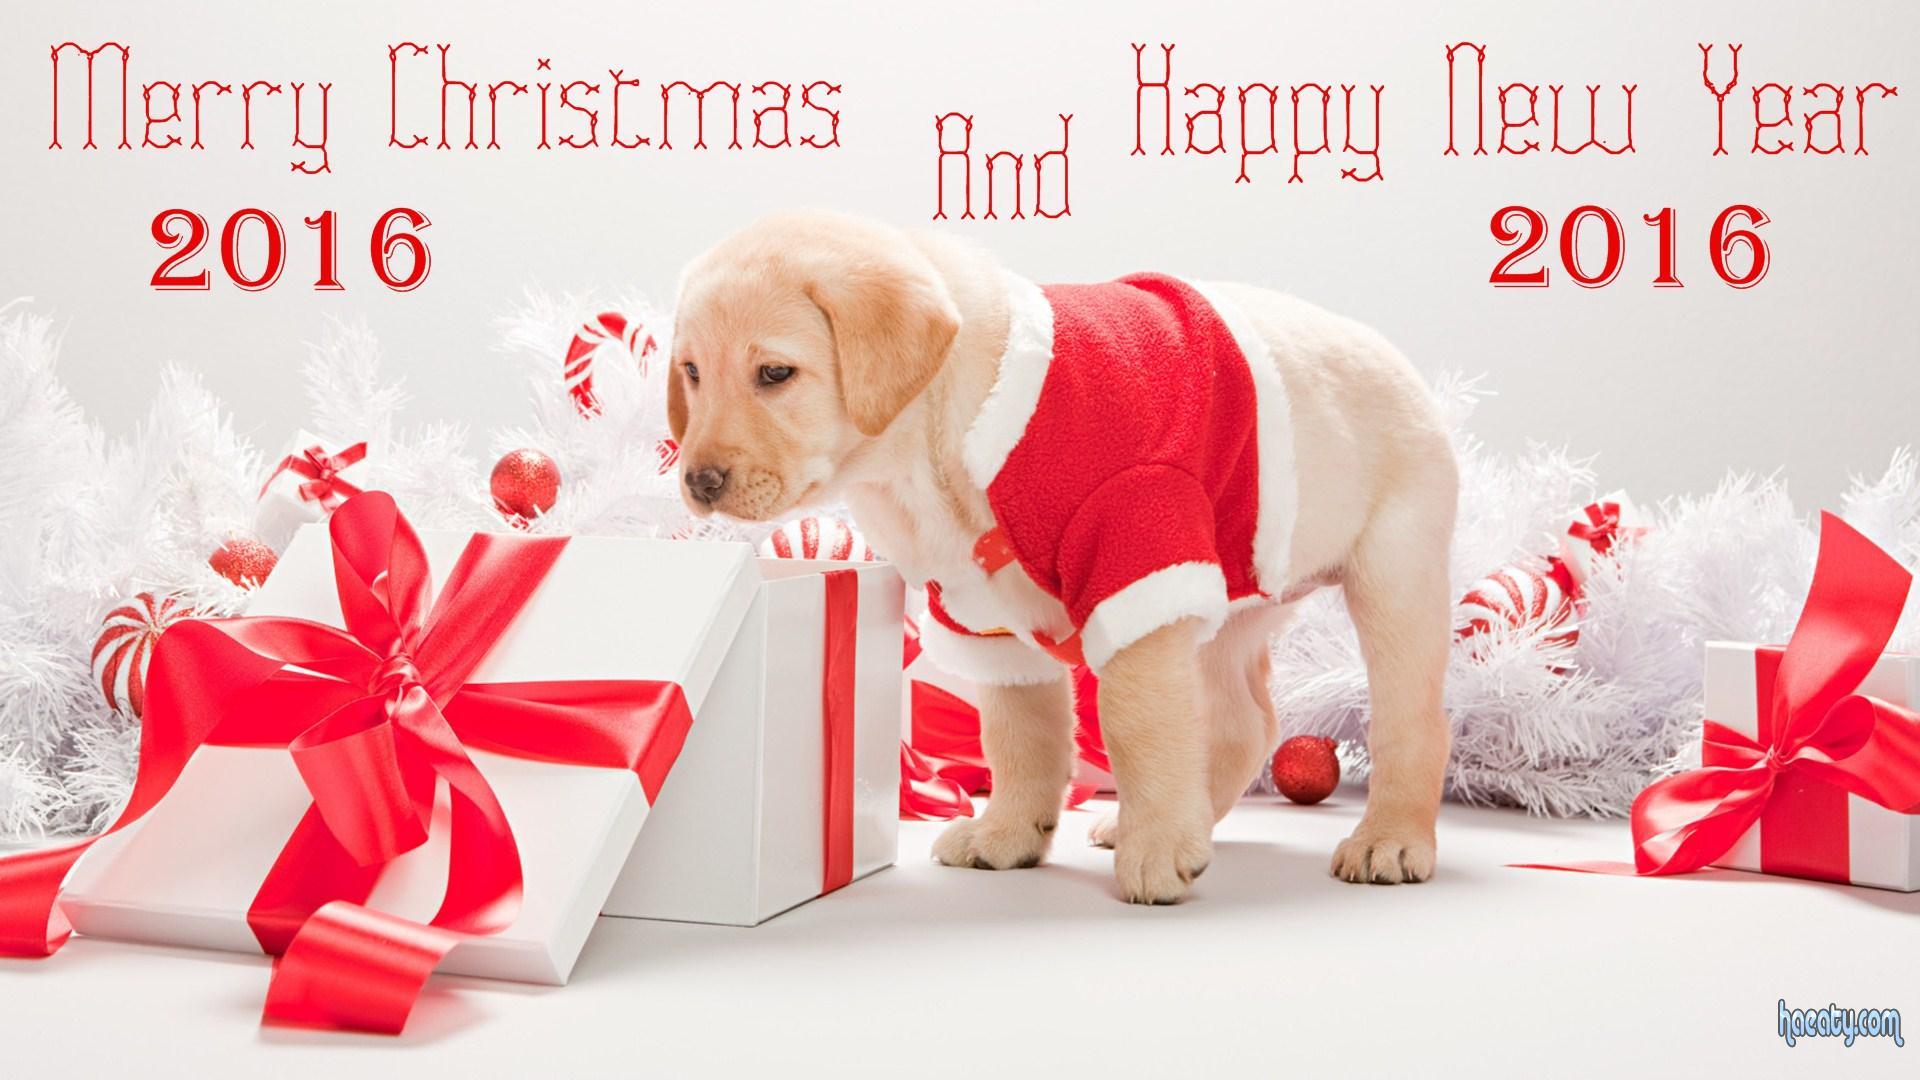 الكريسماس 2016-Merry-Christmas-and-Happy-new-year-2016 145054043591.jpg